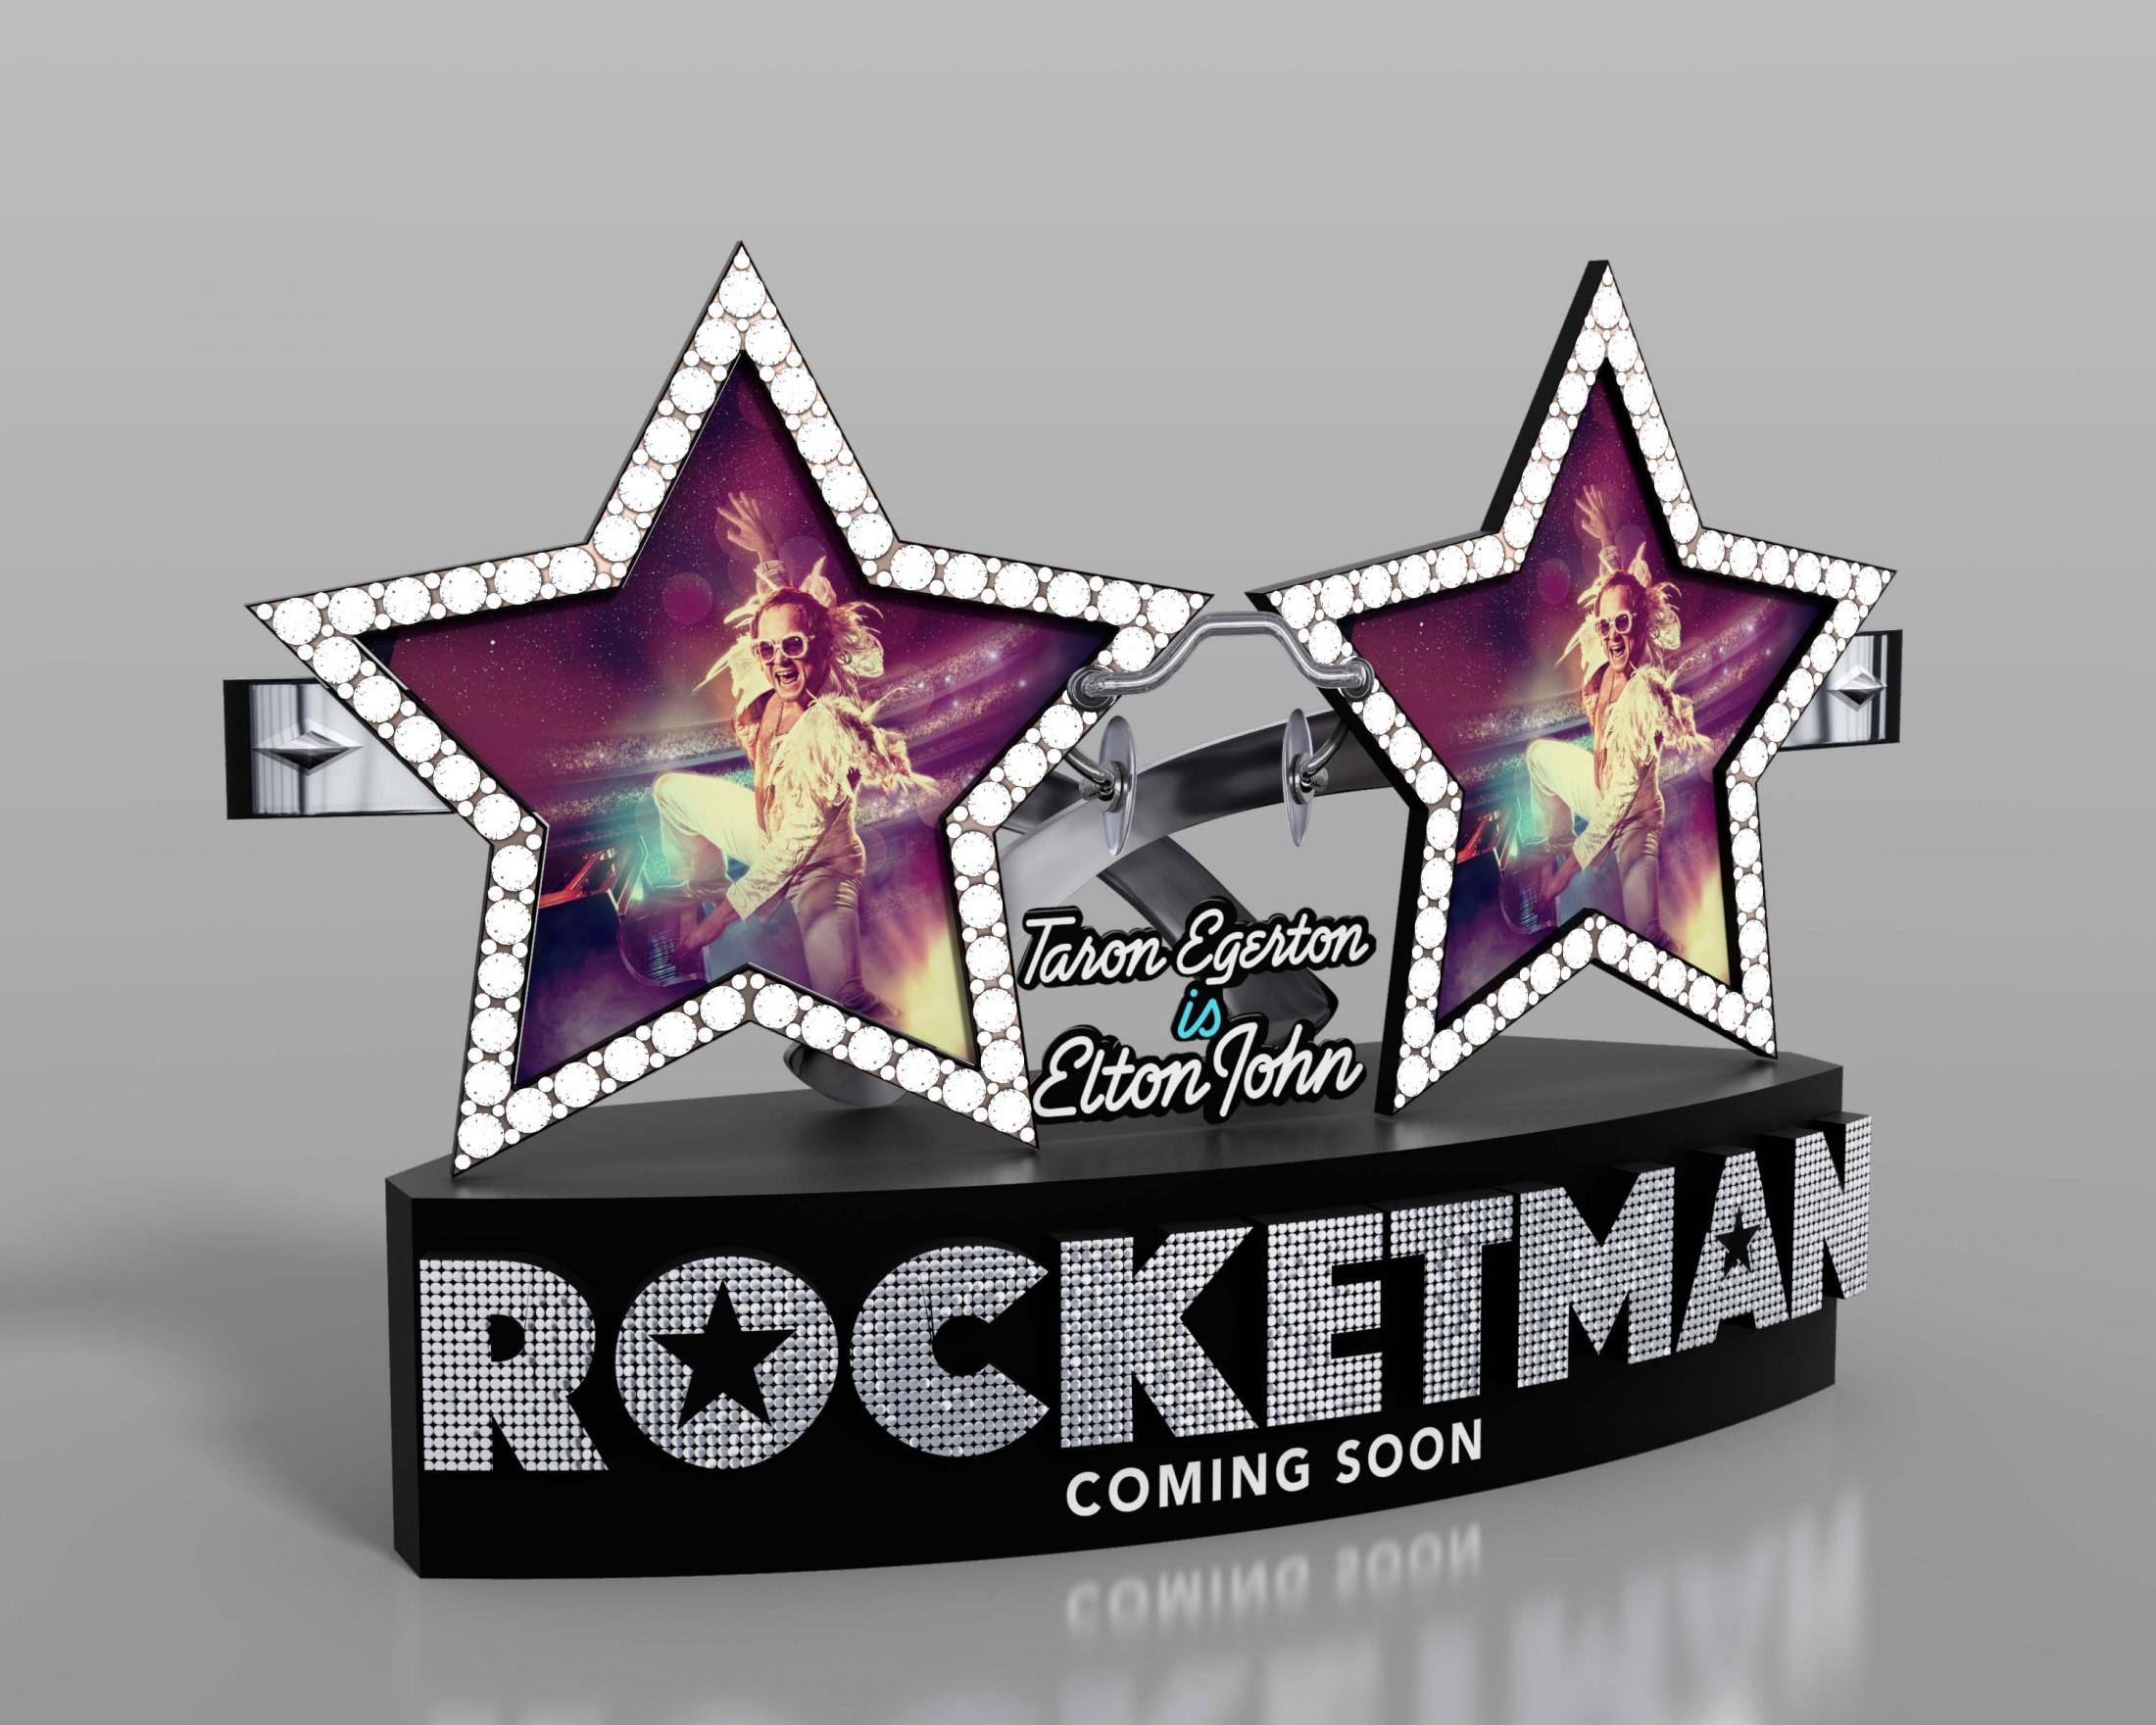 Thumbnail for Rocketman International In-Theatre Standee